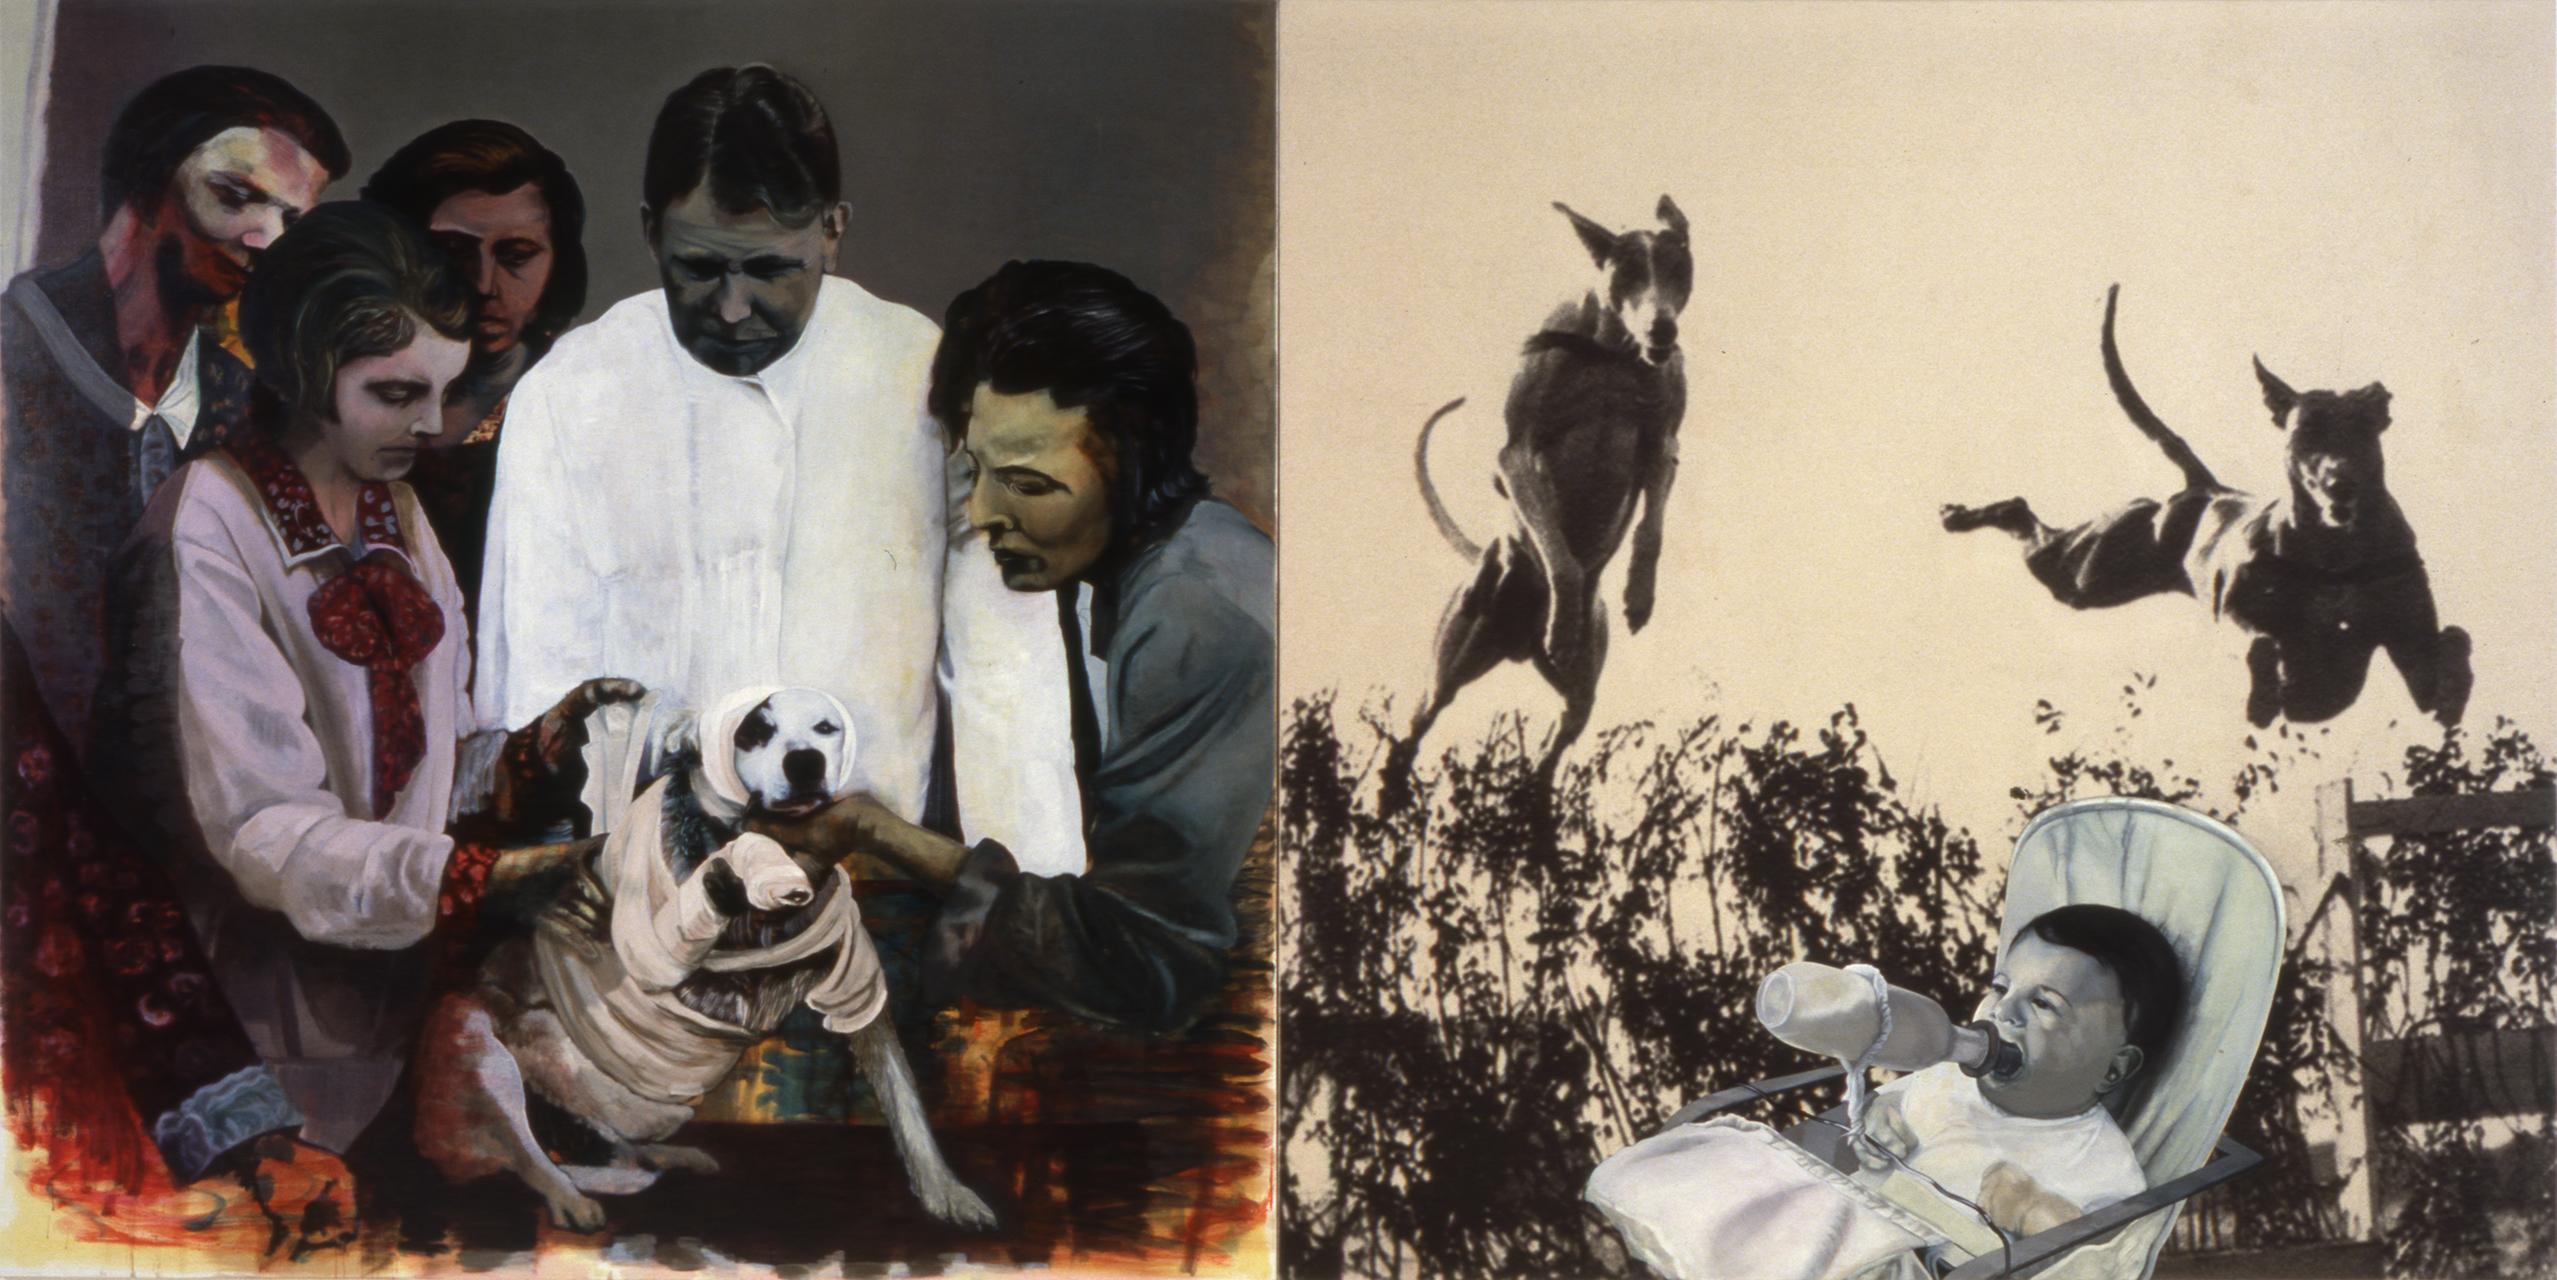 13_Robert_Smit_Care_1997_1998_acrylic_tempera_oil_print_canvas_200x400cm_1280_hoog